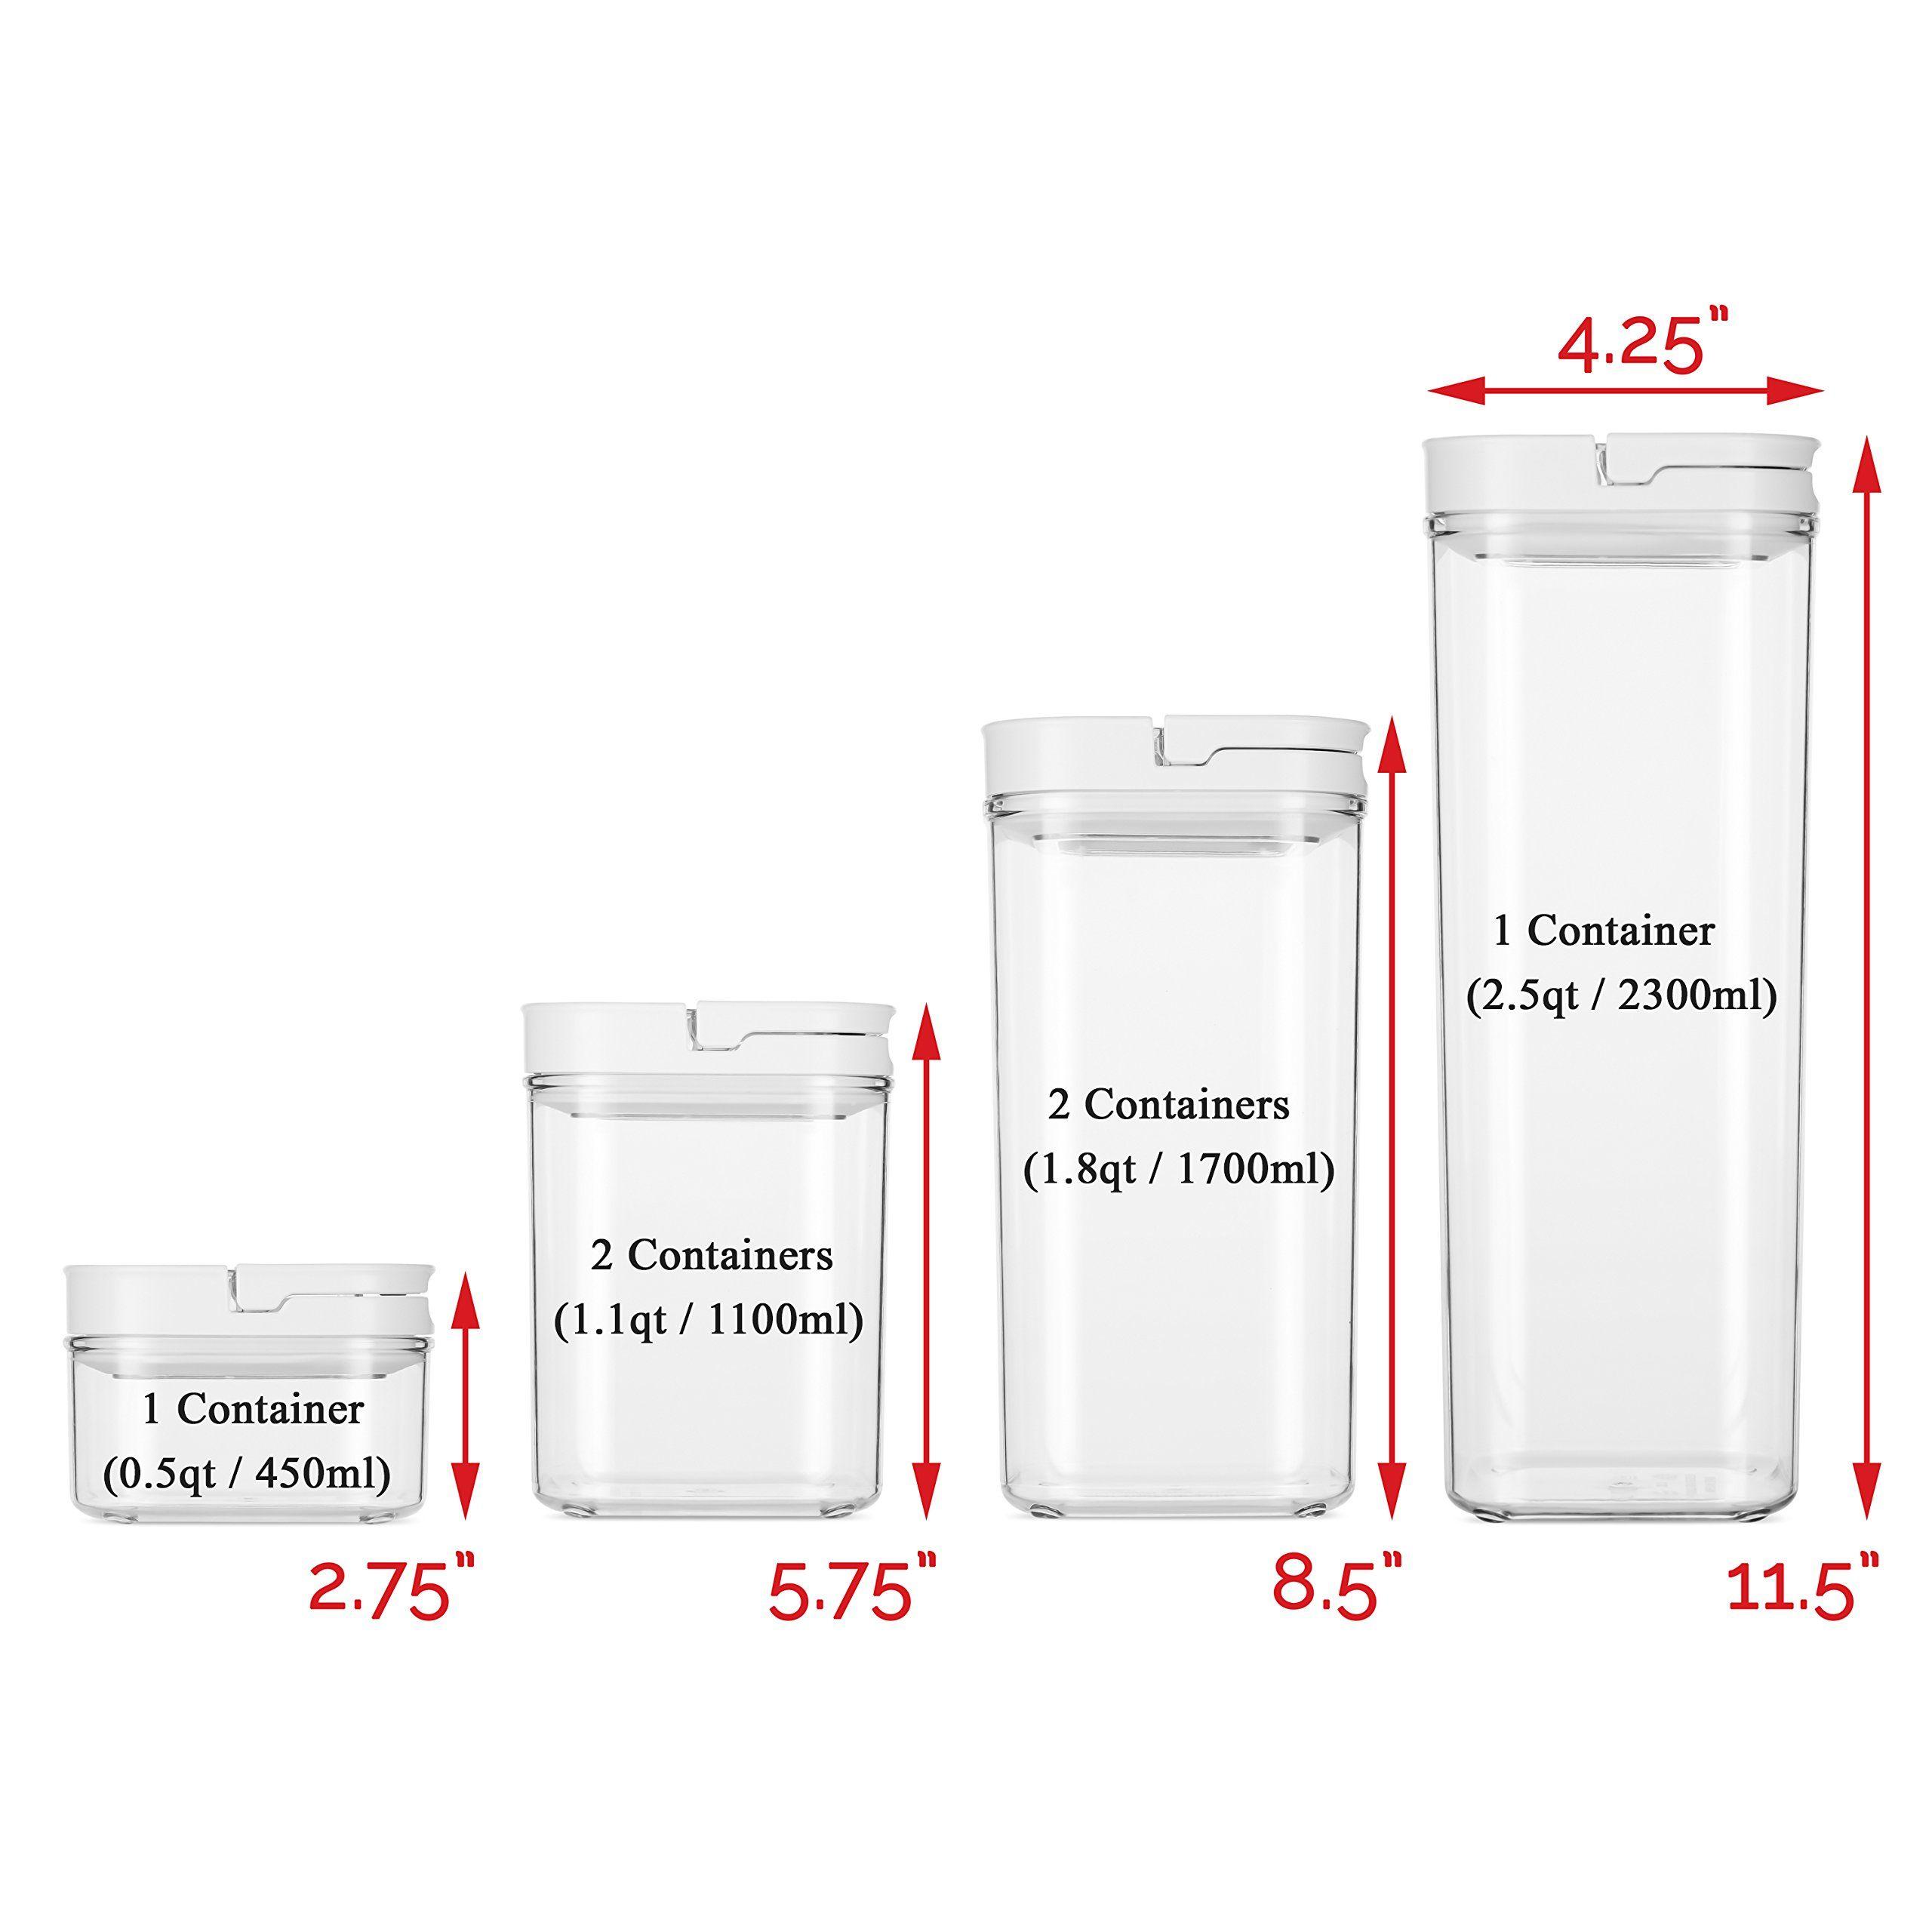 Durahome Fliplock Airtight Food Storage Containers 6 Piece Set